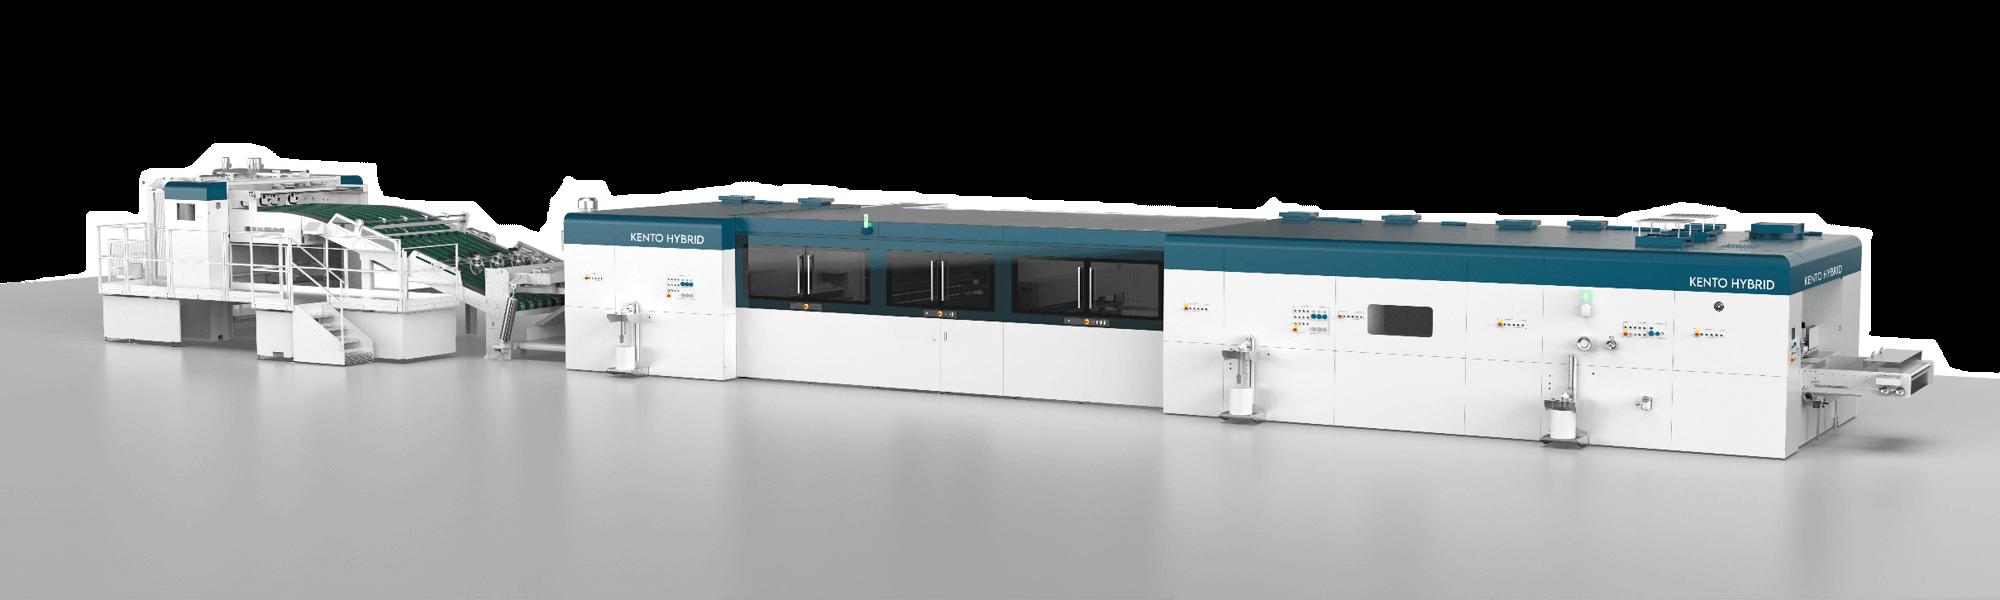 Kento Hybrid render